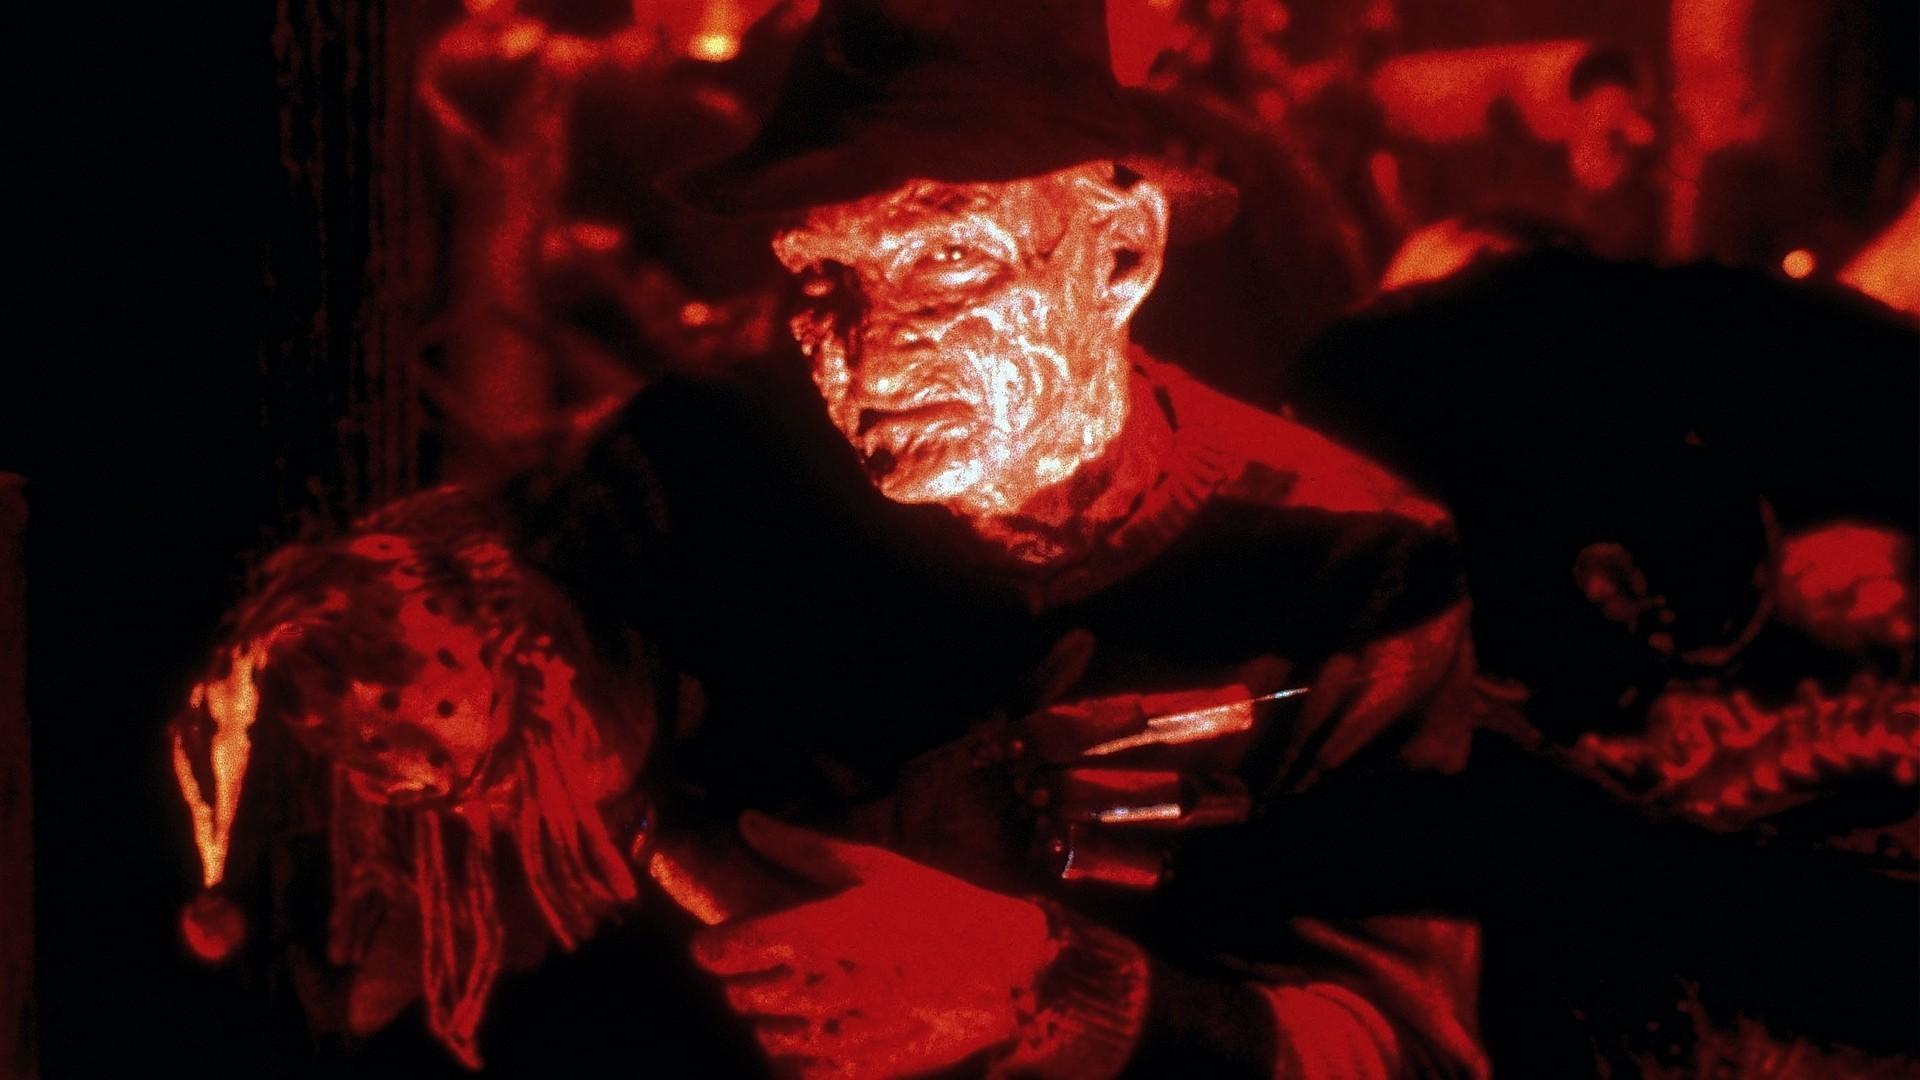 Most Viewed A Nightmare On Elm Street 1984 Wallpapers 4k